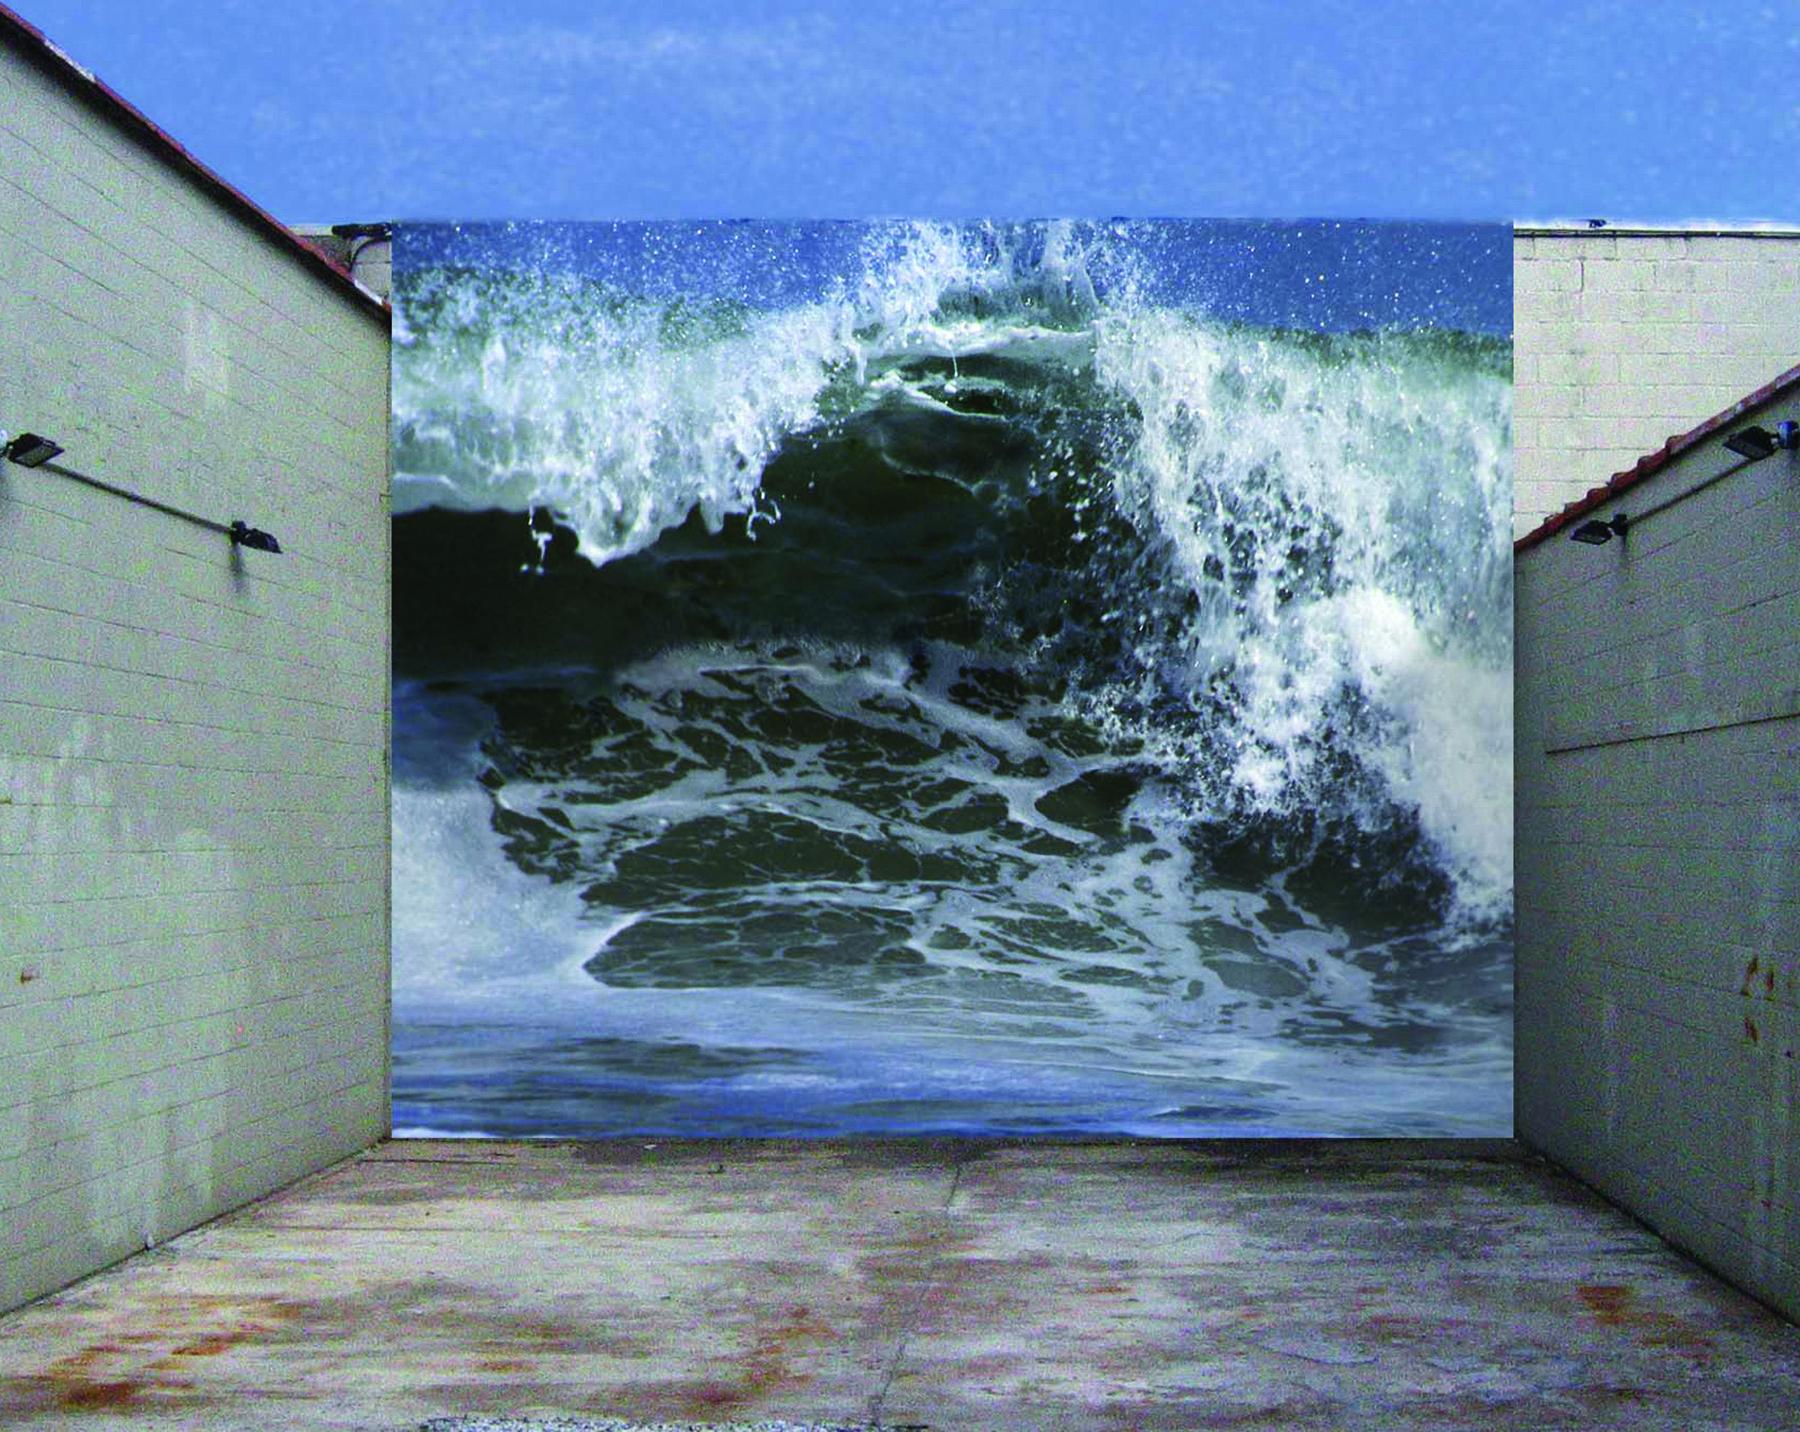 Image: Michael Krondl, Wave, digital photo on vinyl /©Michael Krondl